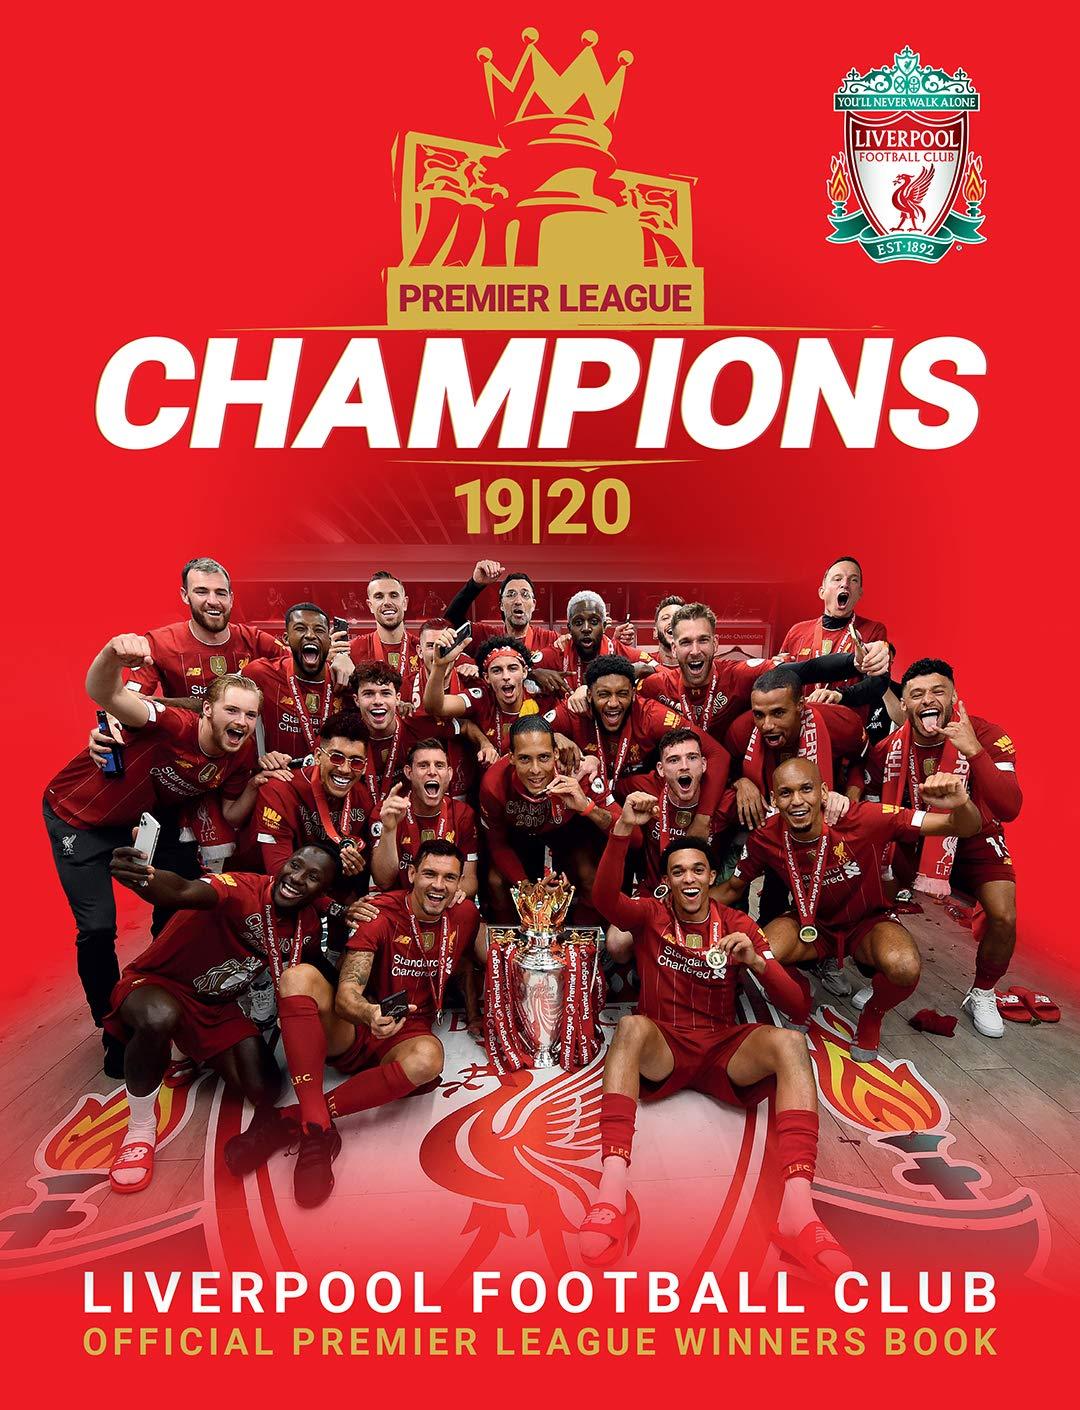 Champions: Liverpool FC: Premier League Winners 19/20: Amazon.de: Liverpool  FC: Fremdsprachige Bücher